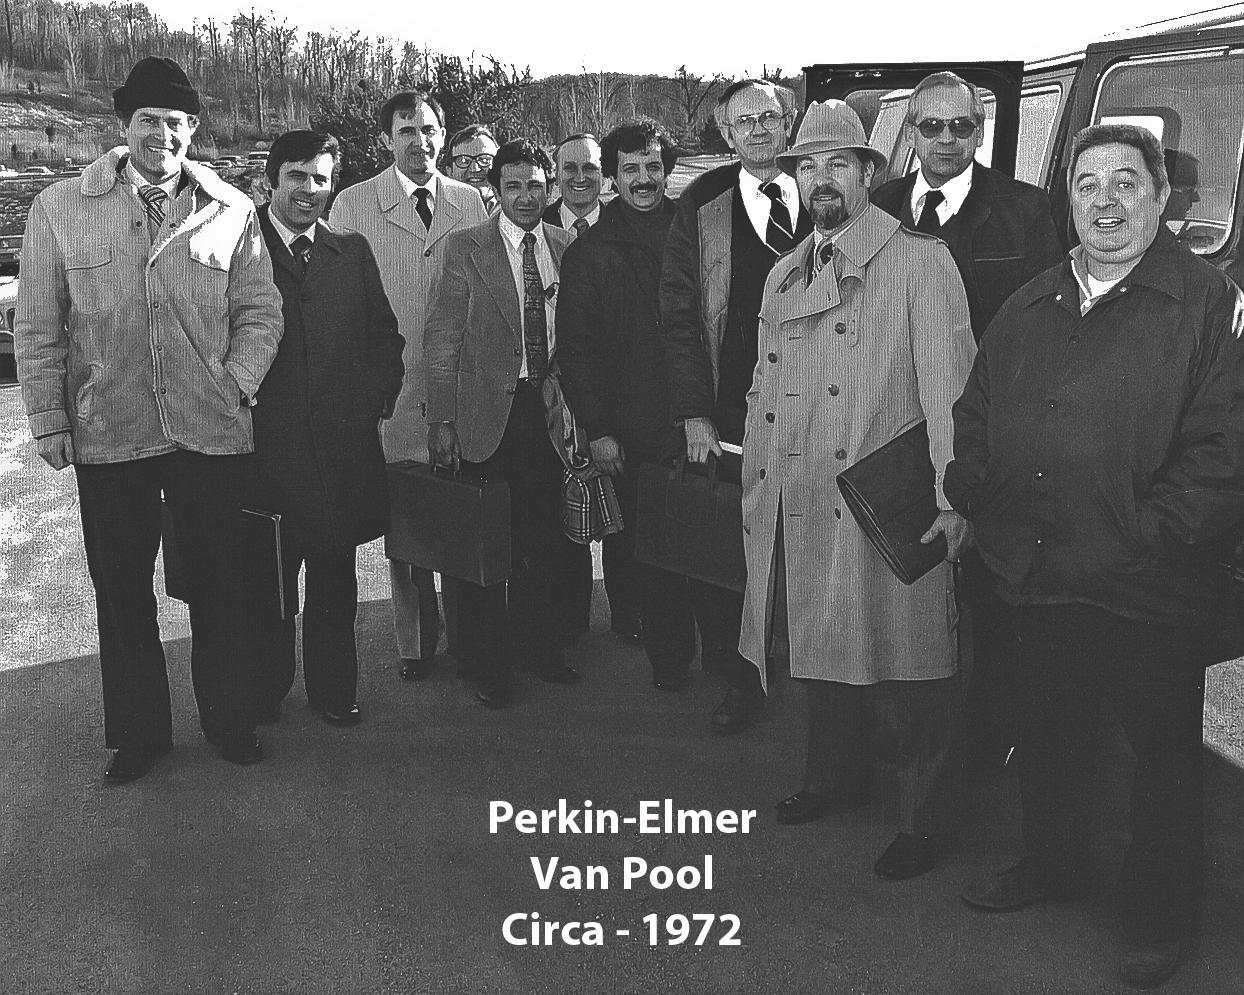 From left Paul Taormina, John Connic, Tom Tracy, Bruce Meyer, Eph Tobin, Bill Morris, Jerry De Clement, Jon Aspinwall, Lou Trapasso, Chet Sokol, John Keating